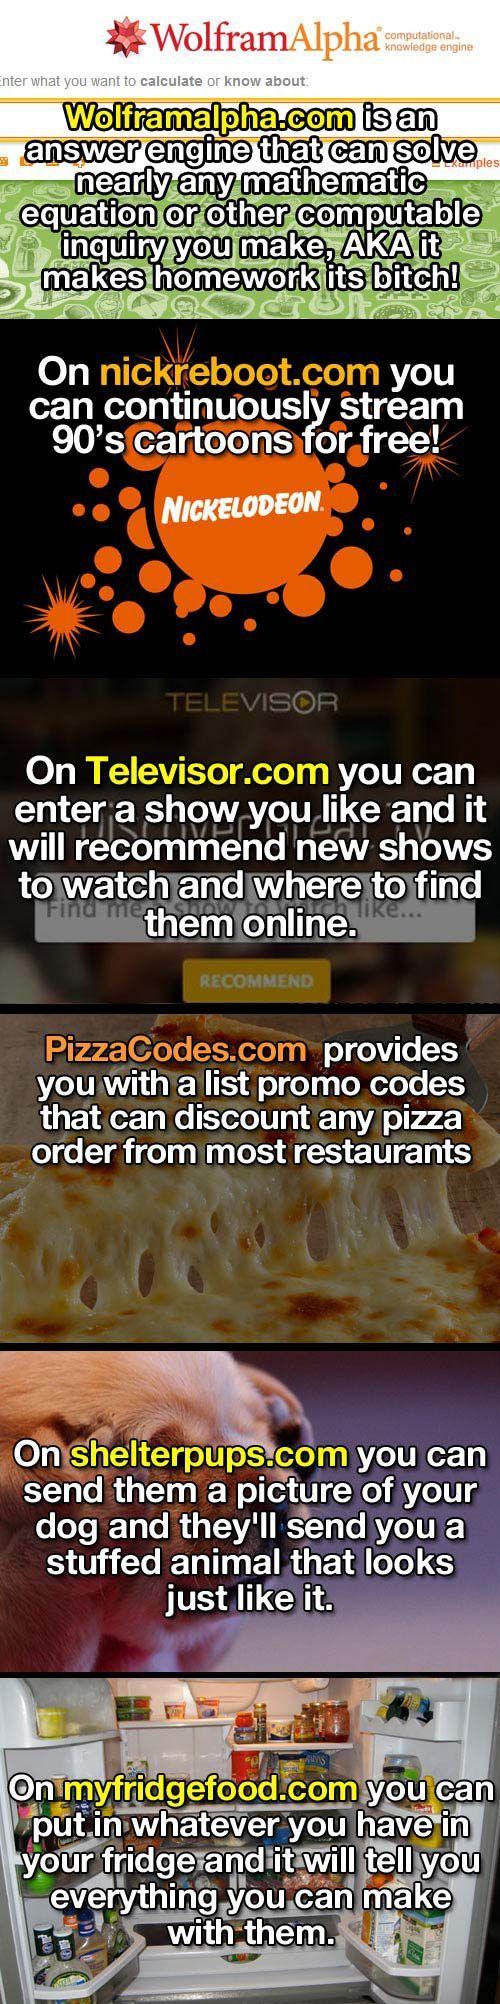 Just a few helpful websites...